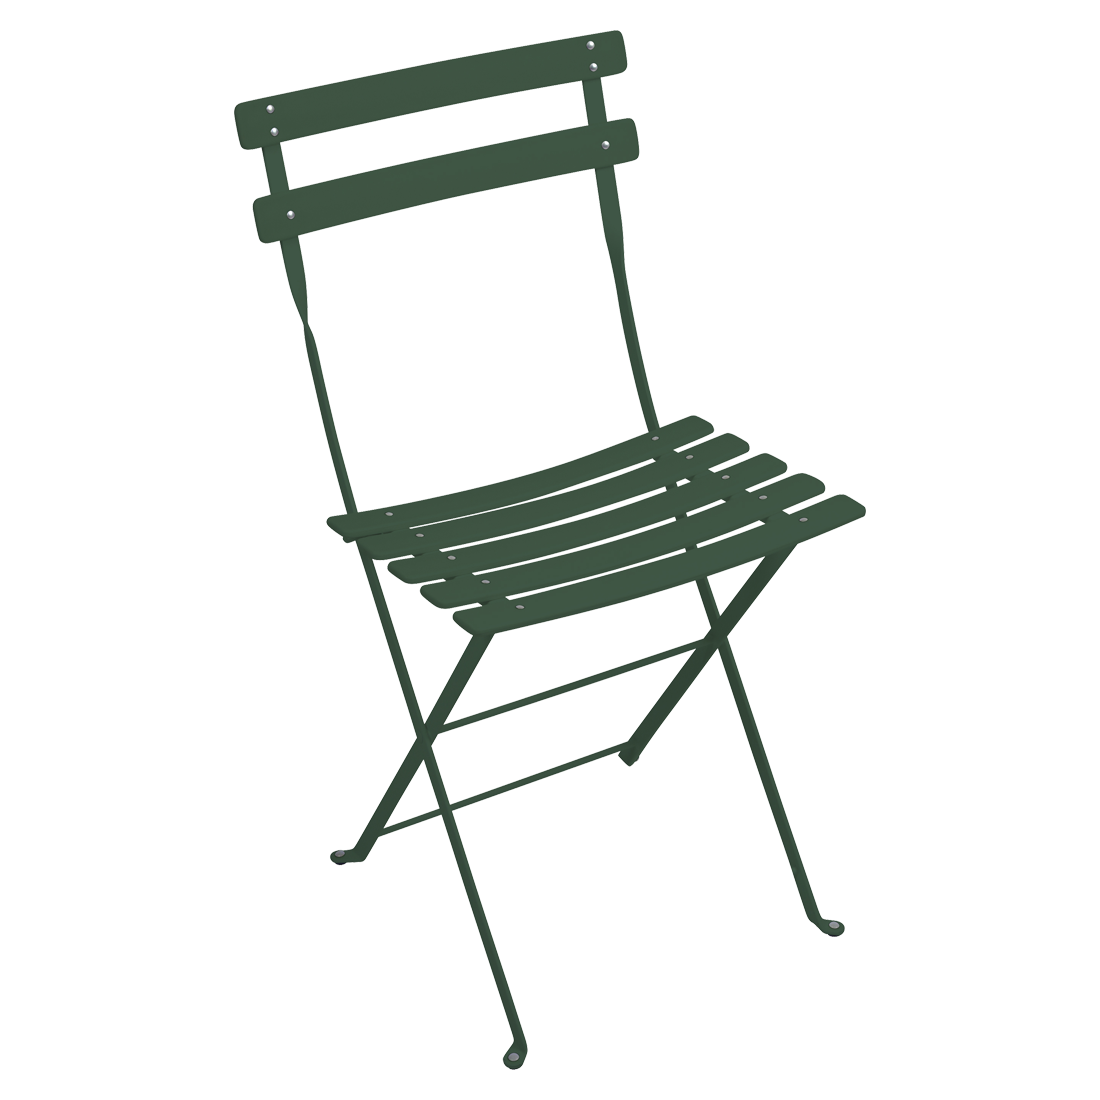 Chaise duraflon bistro chaise en r sine duraflon - Chaise de jardin fermob ...